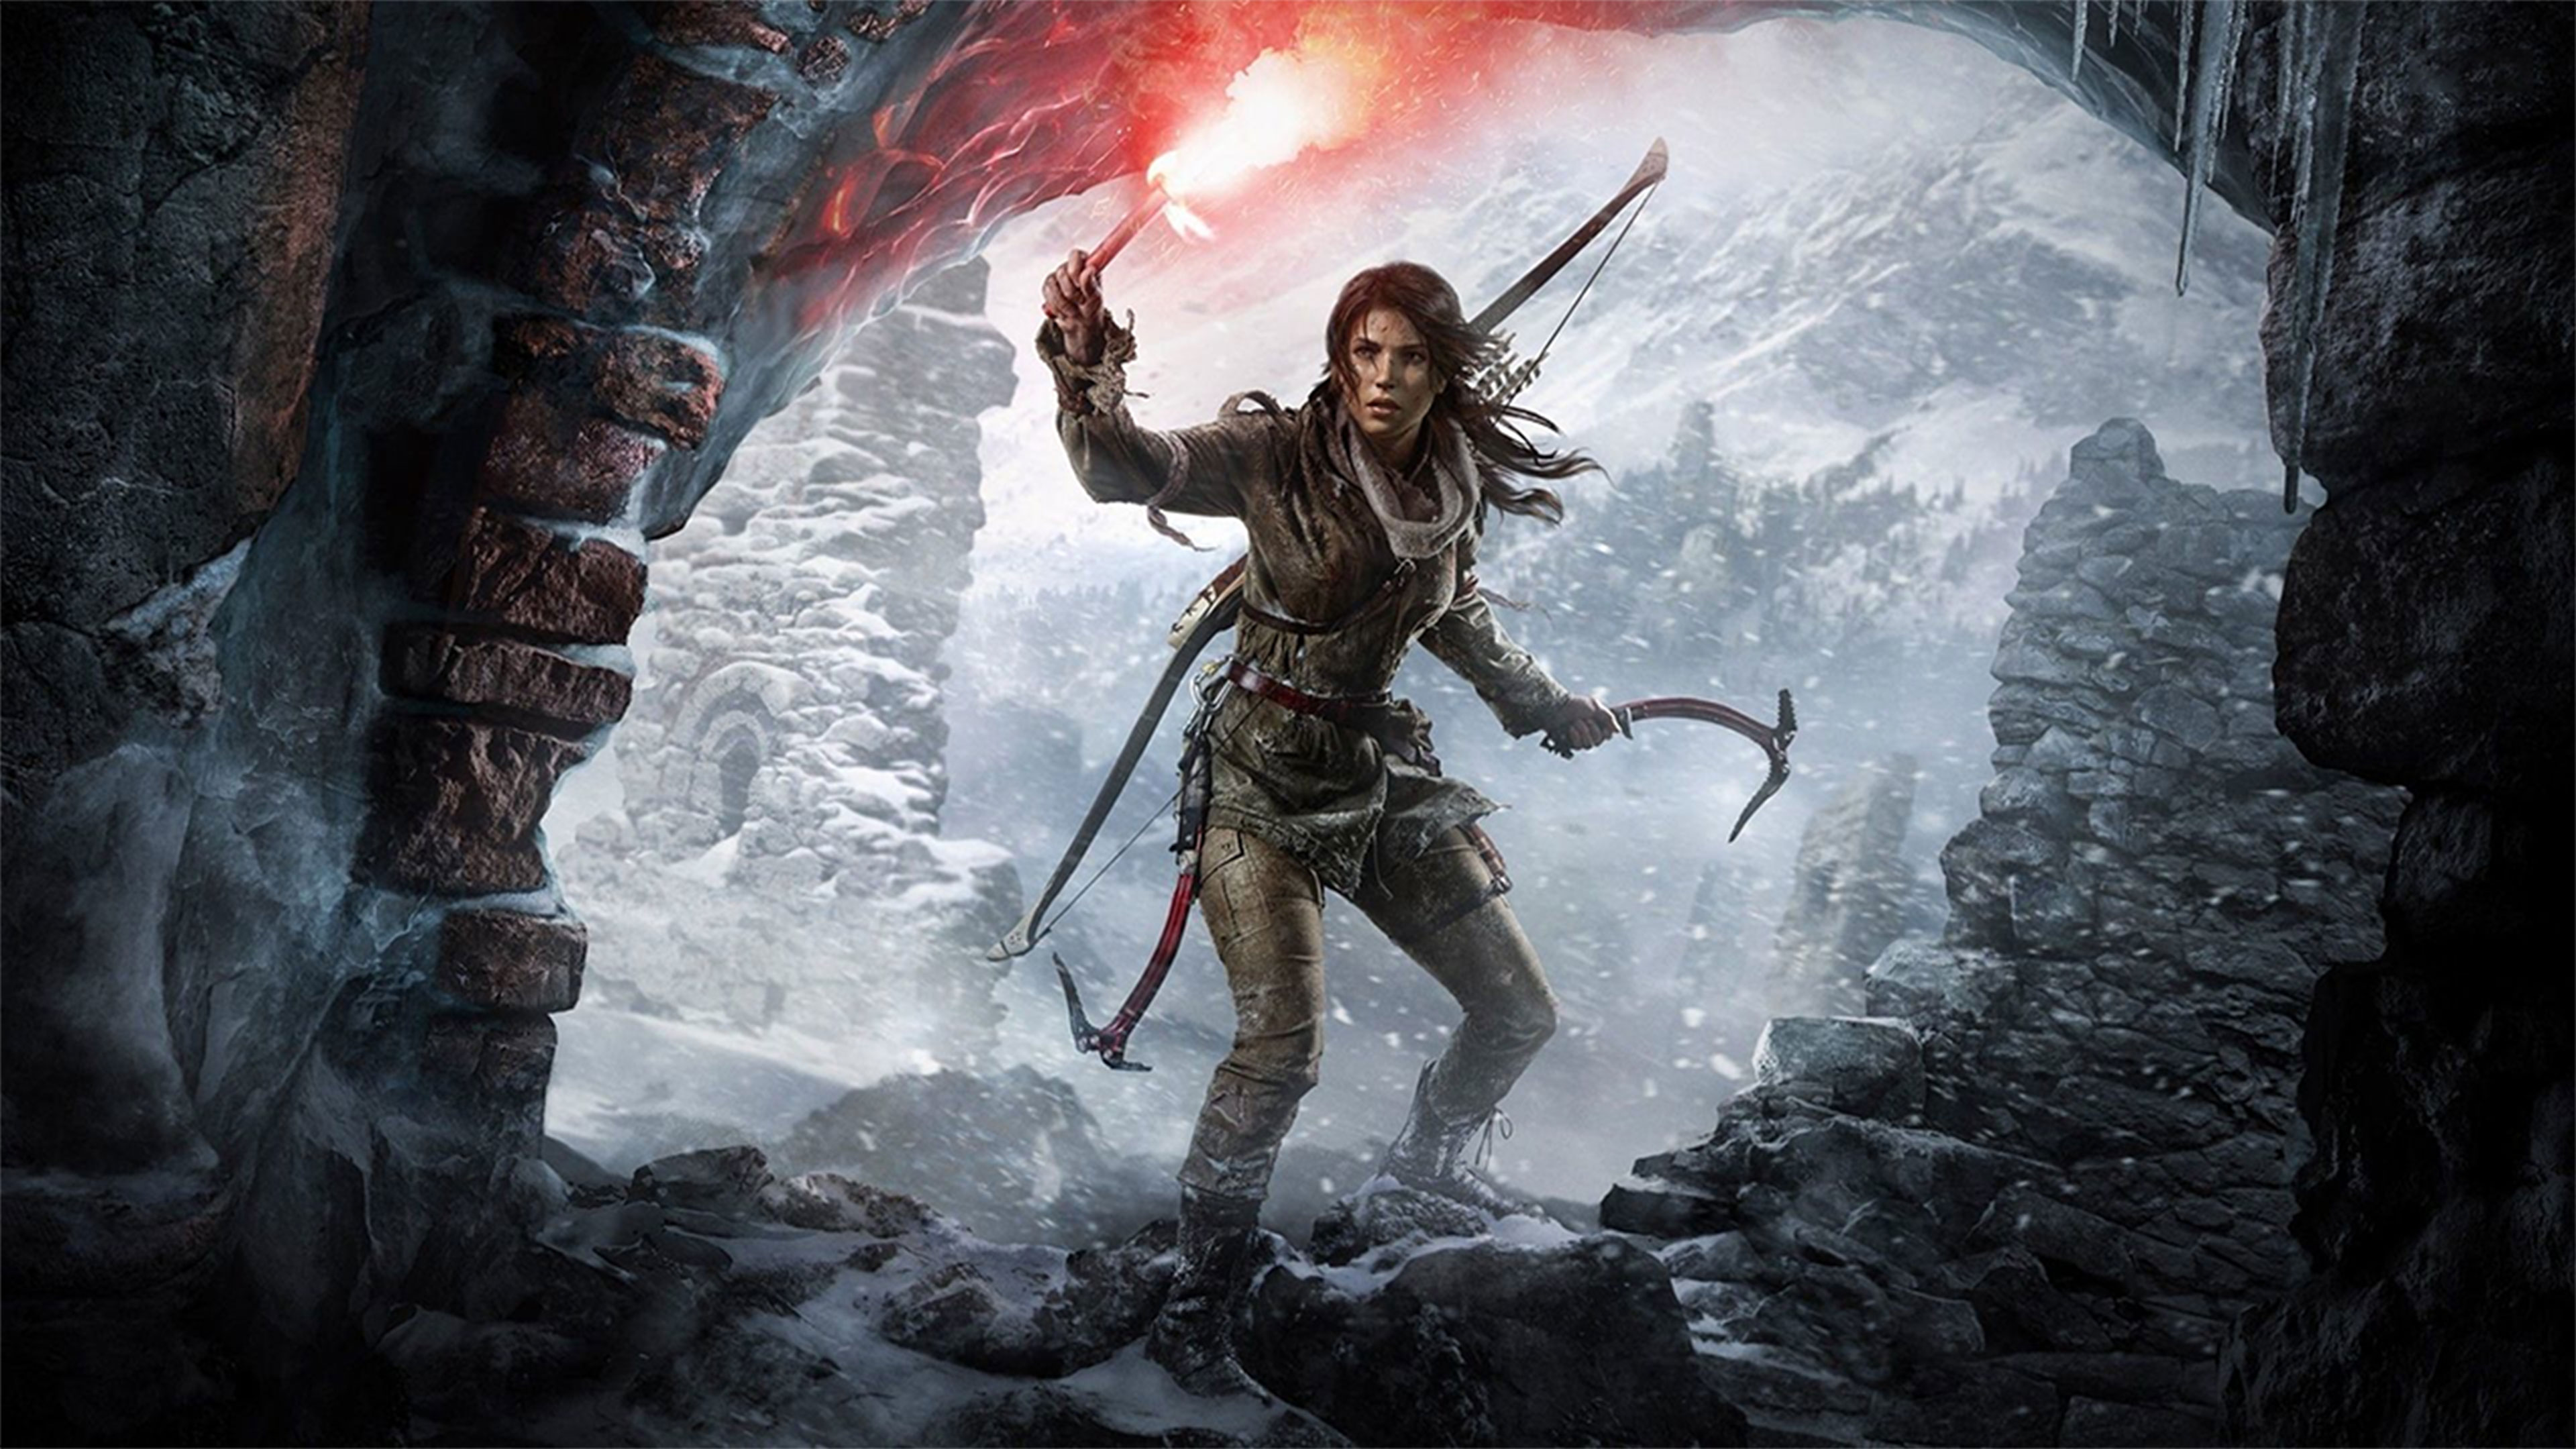 Rise Of The Tomb Raider 4k Wallpaper Gameranx - Rise Of The Tomb Raider Wallpaper 4k , HD Wallpaper & Backgrounds